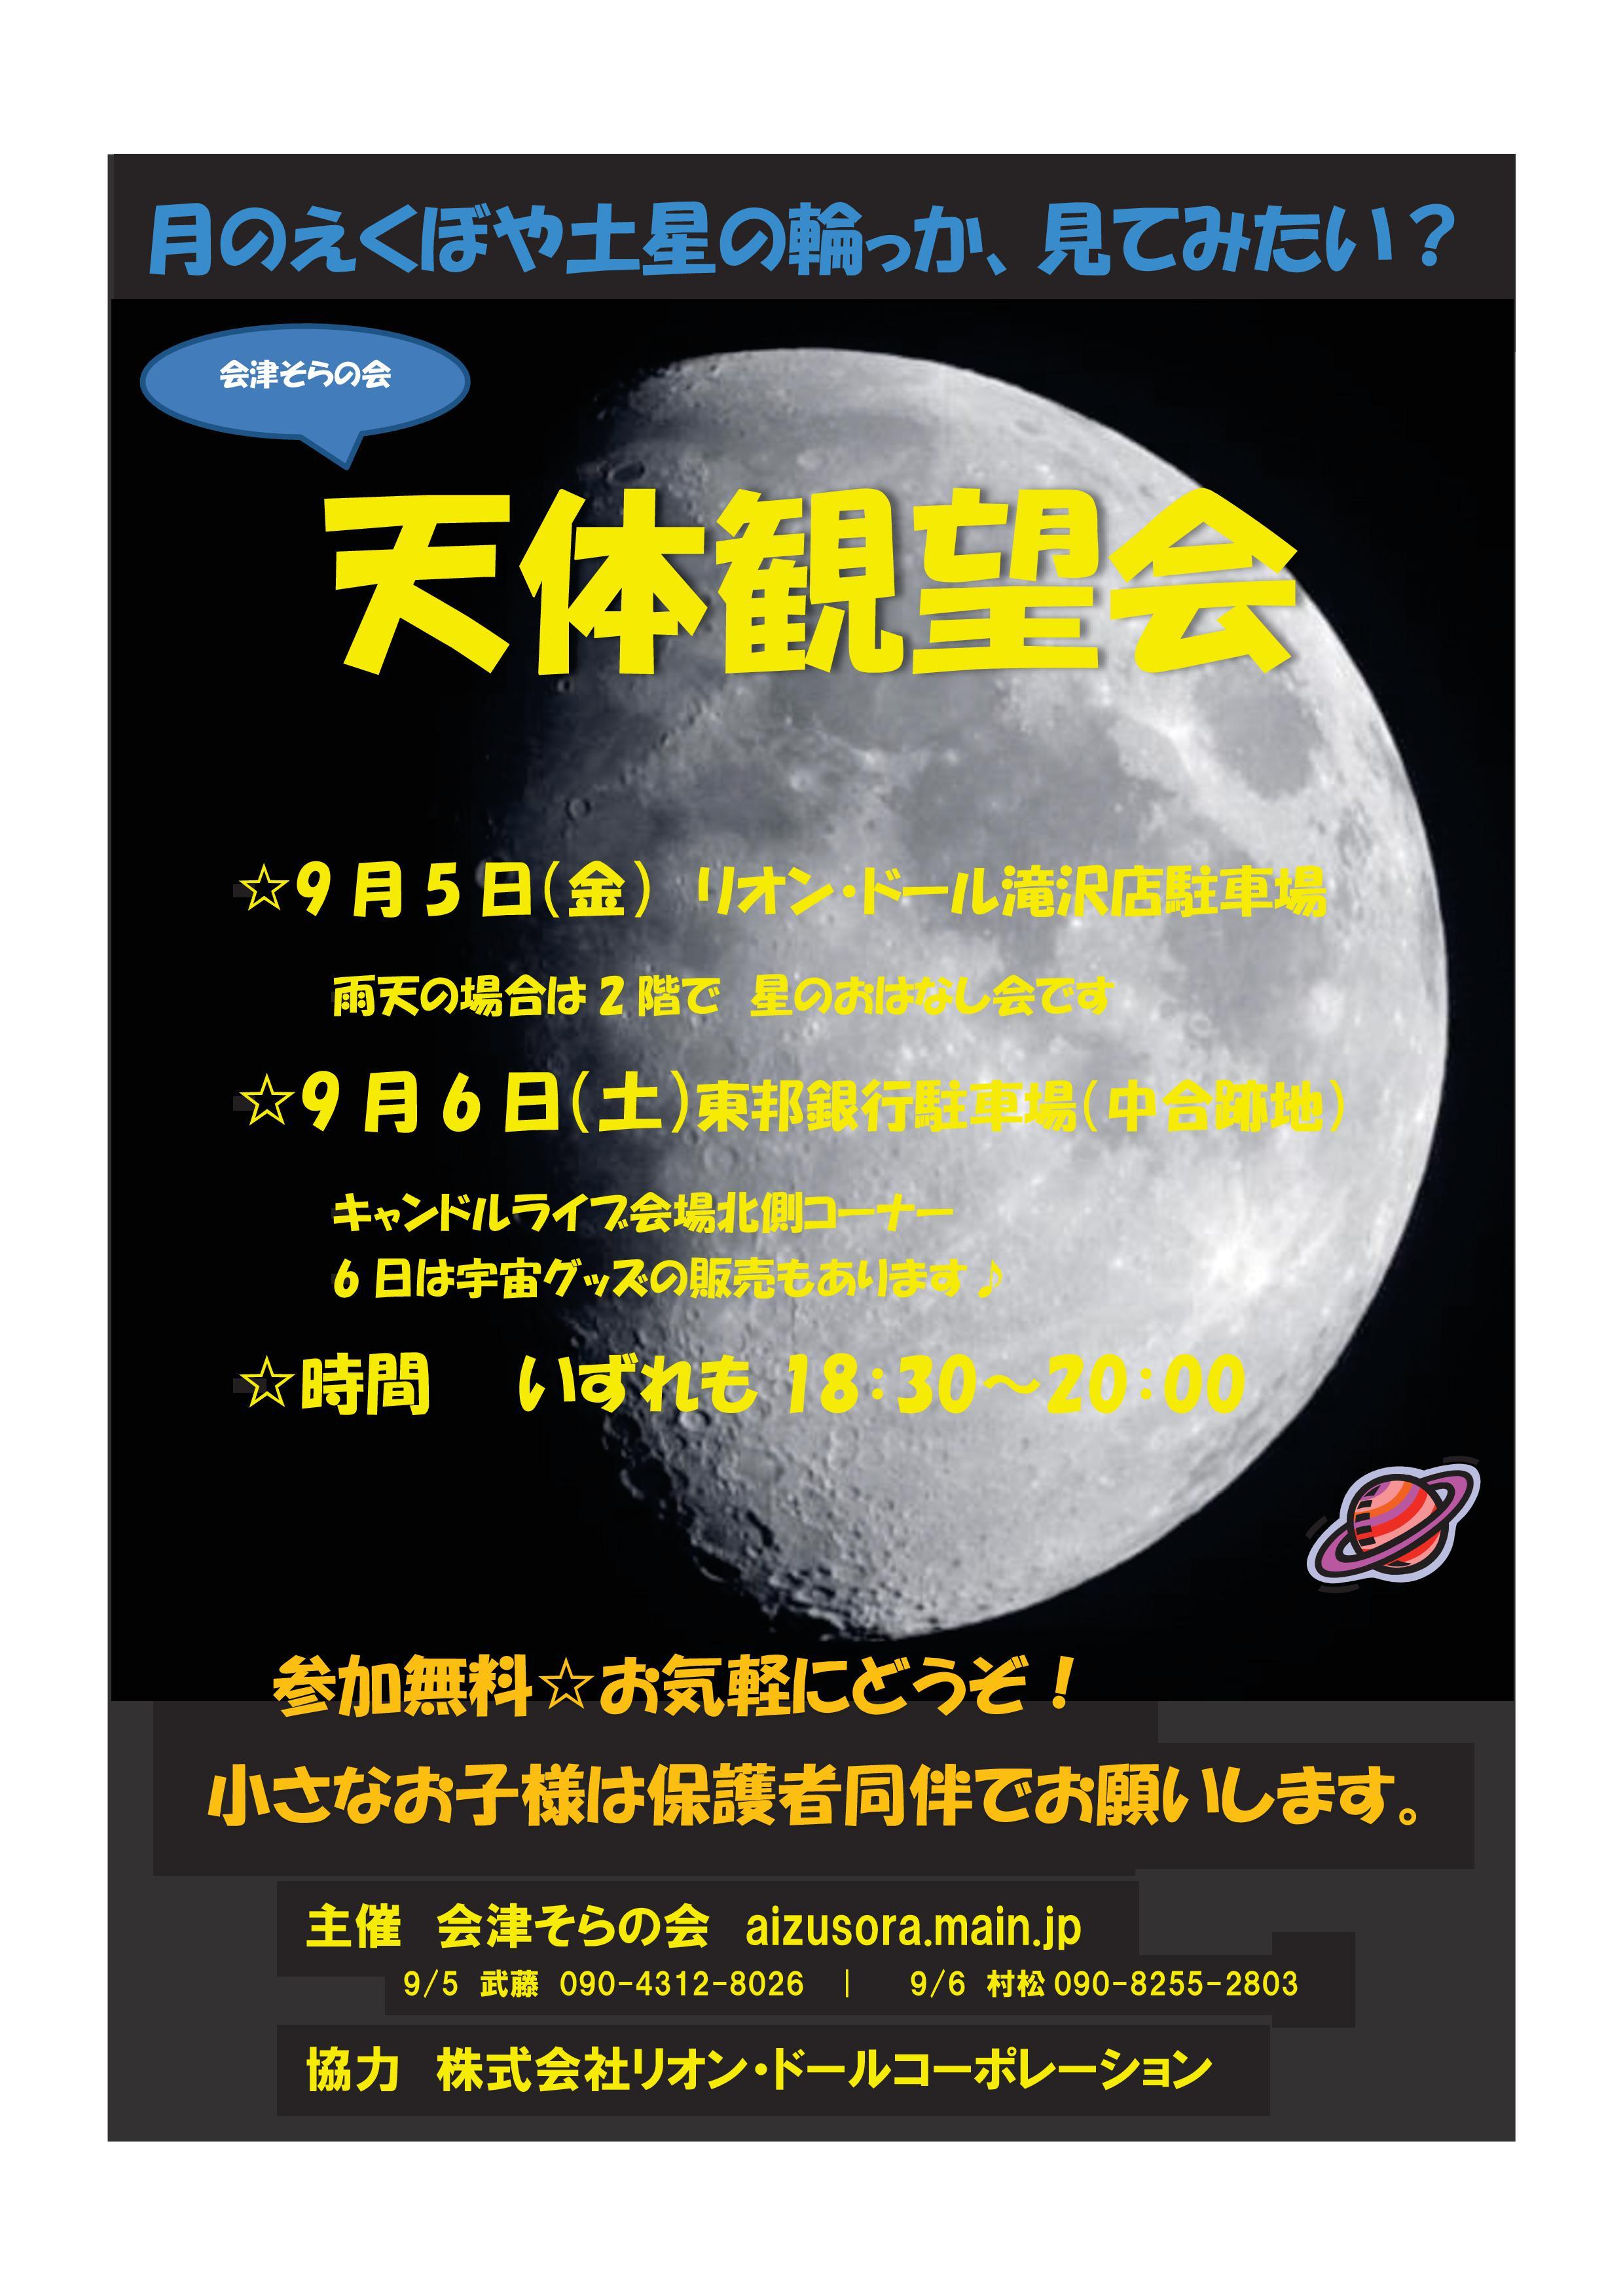 天体観望会 9/5と9/6